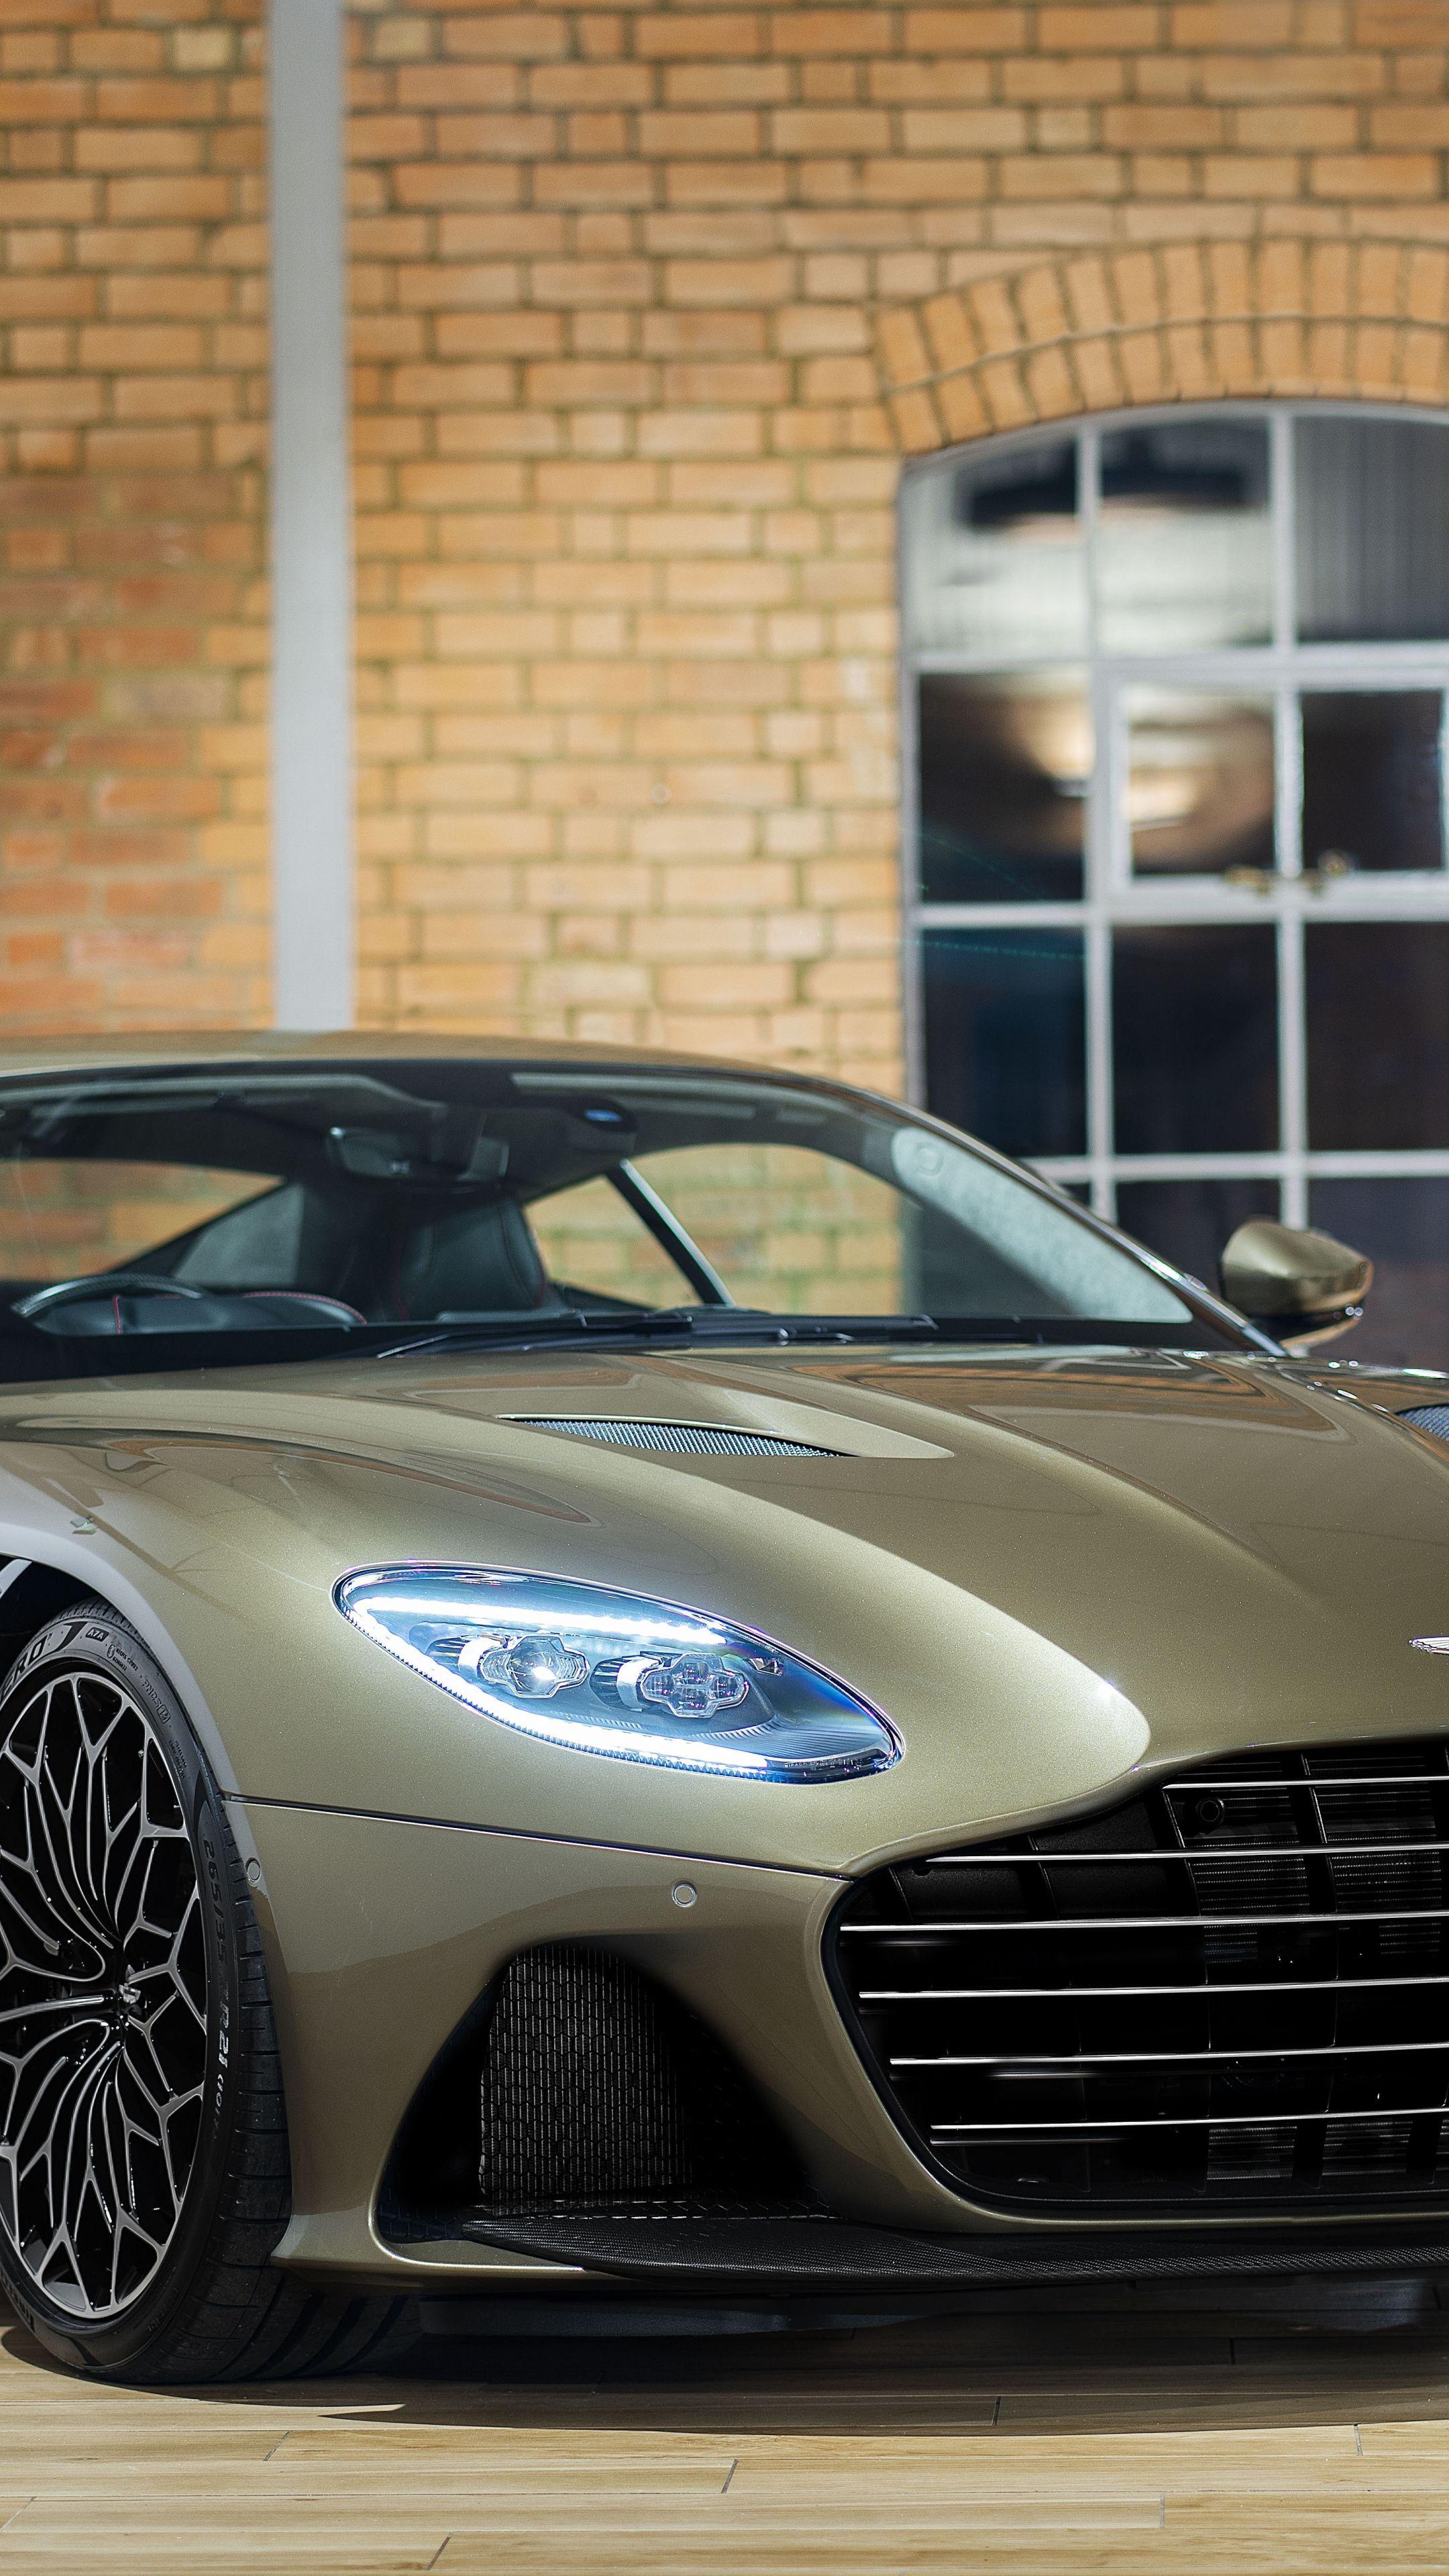 2160x3840 Luxury Car Aston Martin Dbs Superleggera Luxurious Green Wallpaper Aston Martin Dbs Aston Martin Superleggera